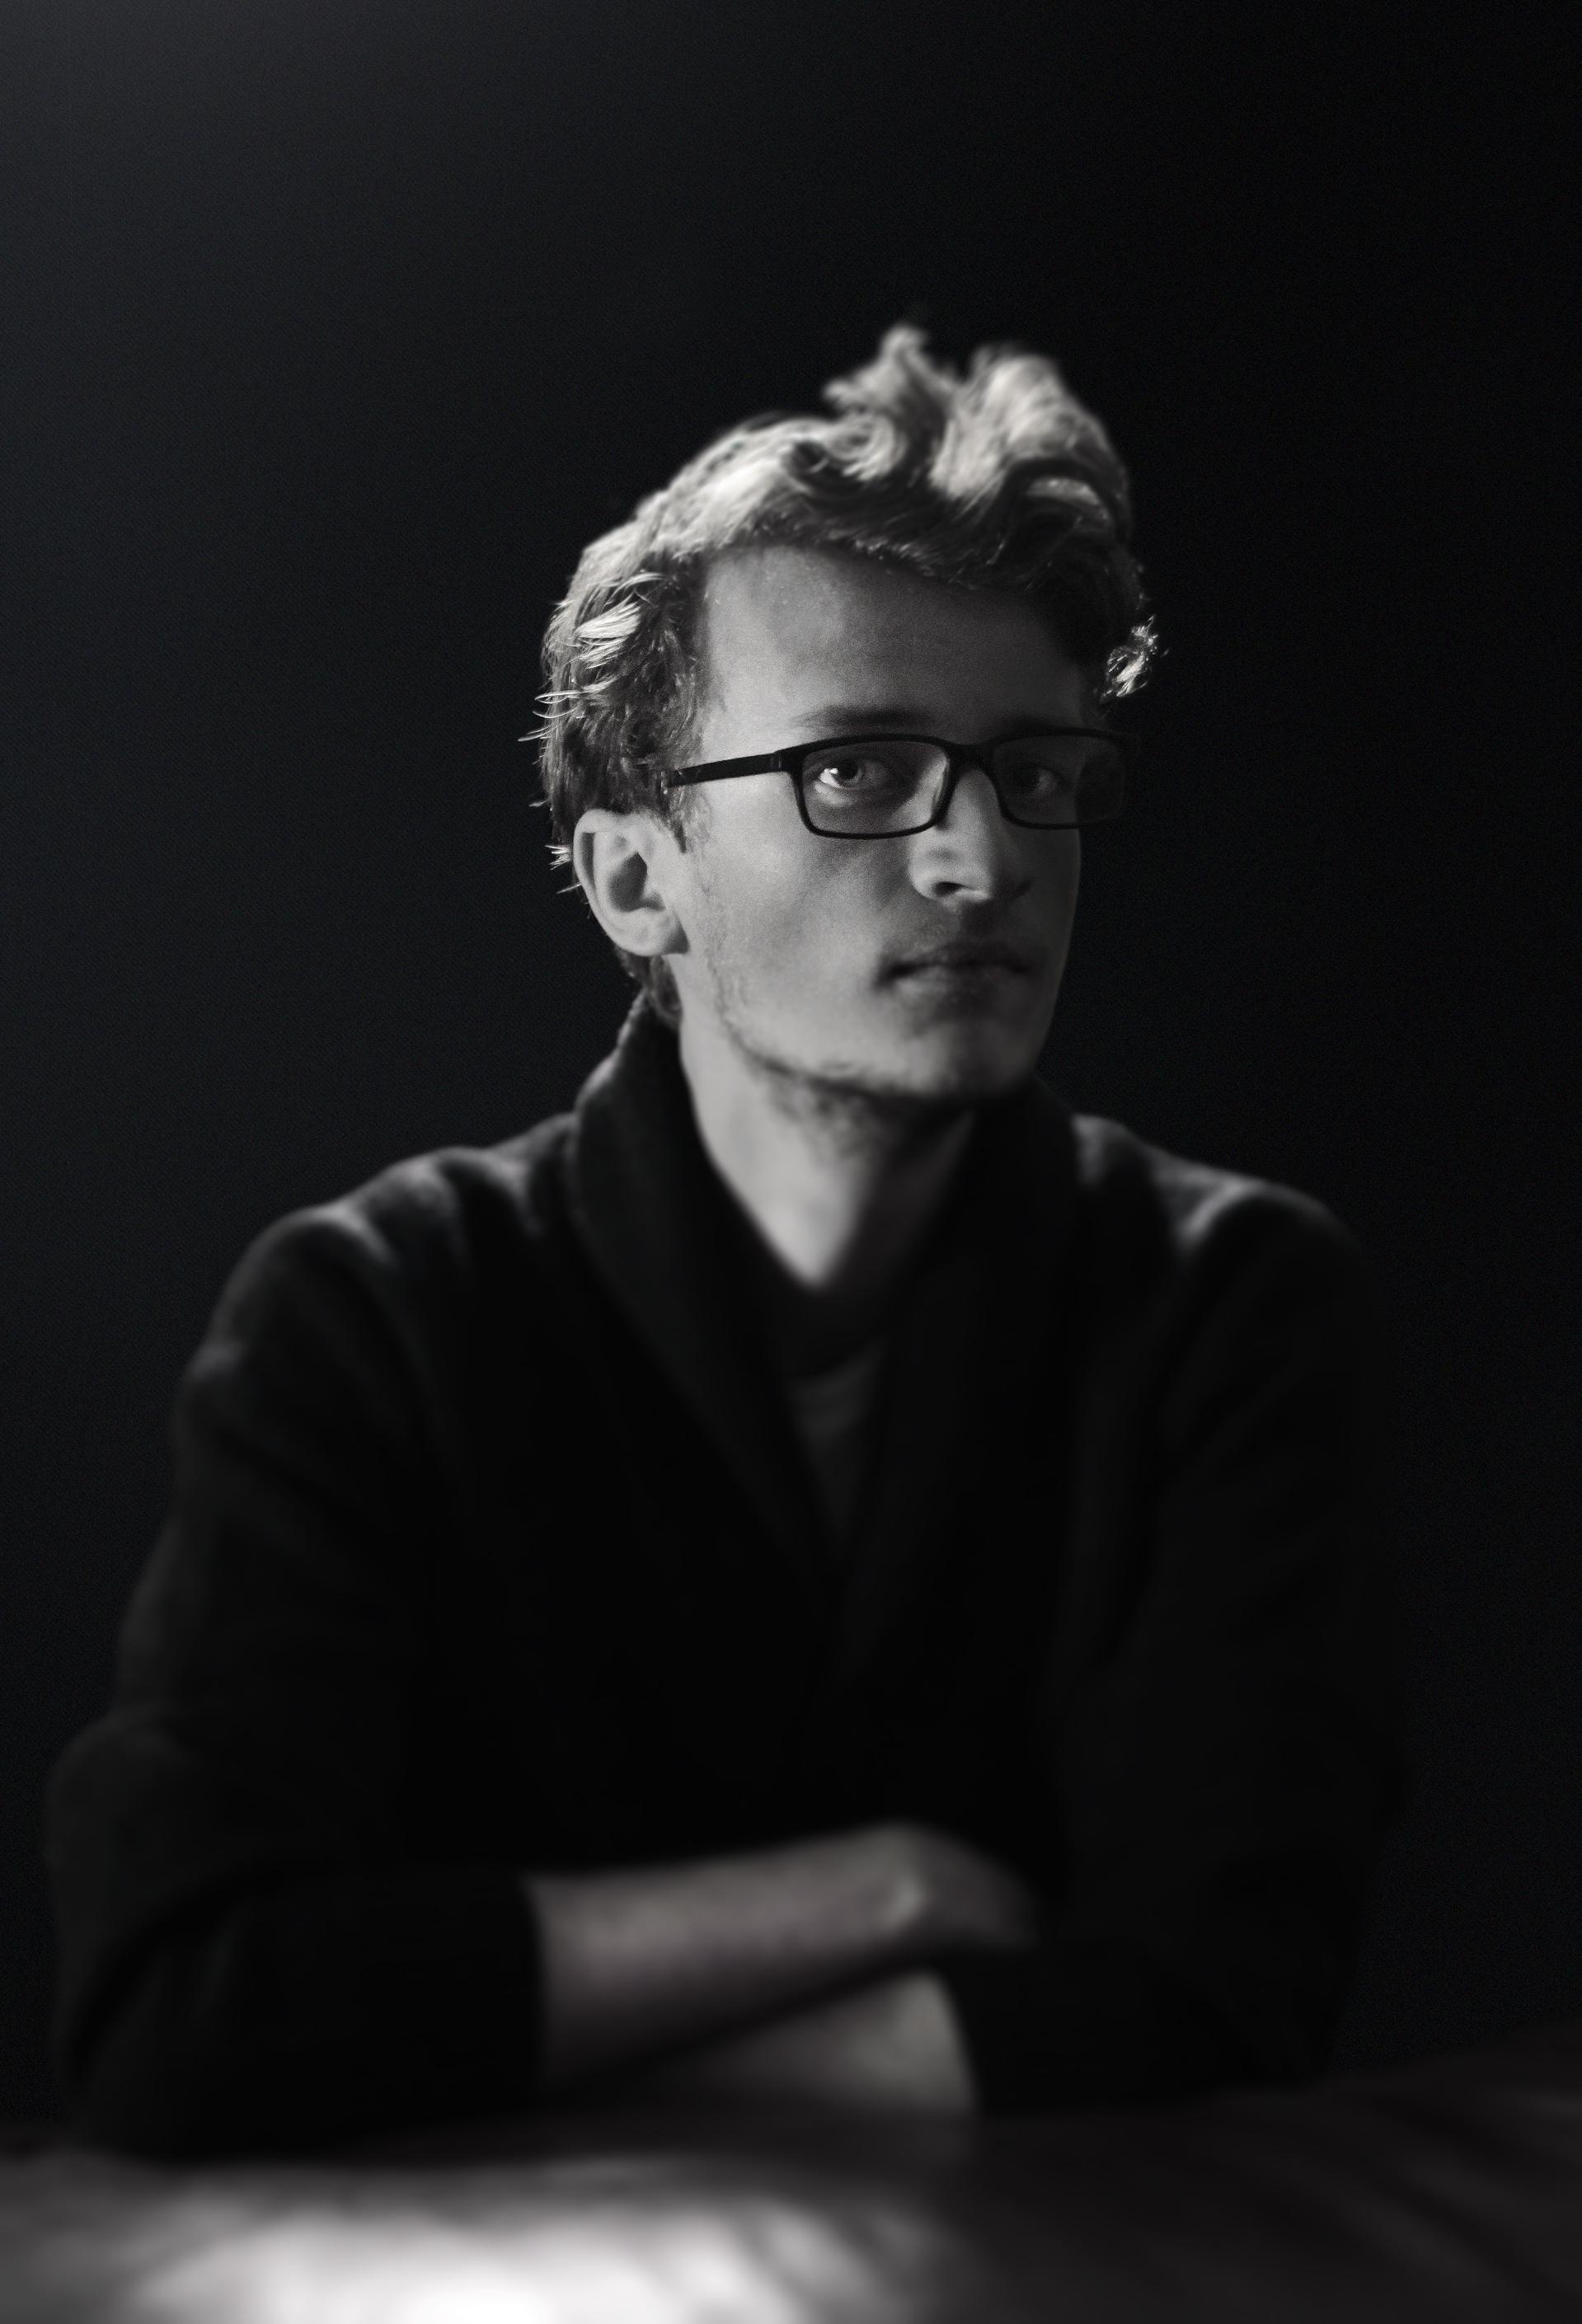 James Hastings Filmmaker